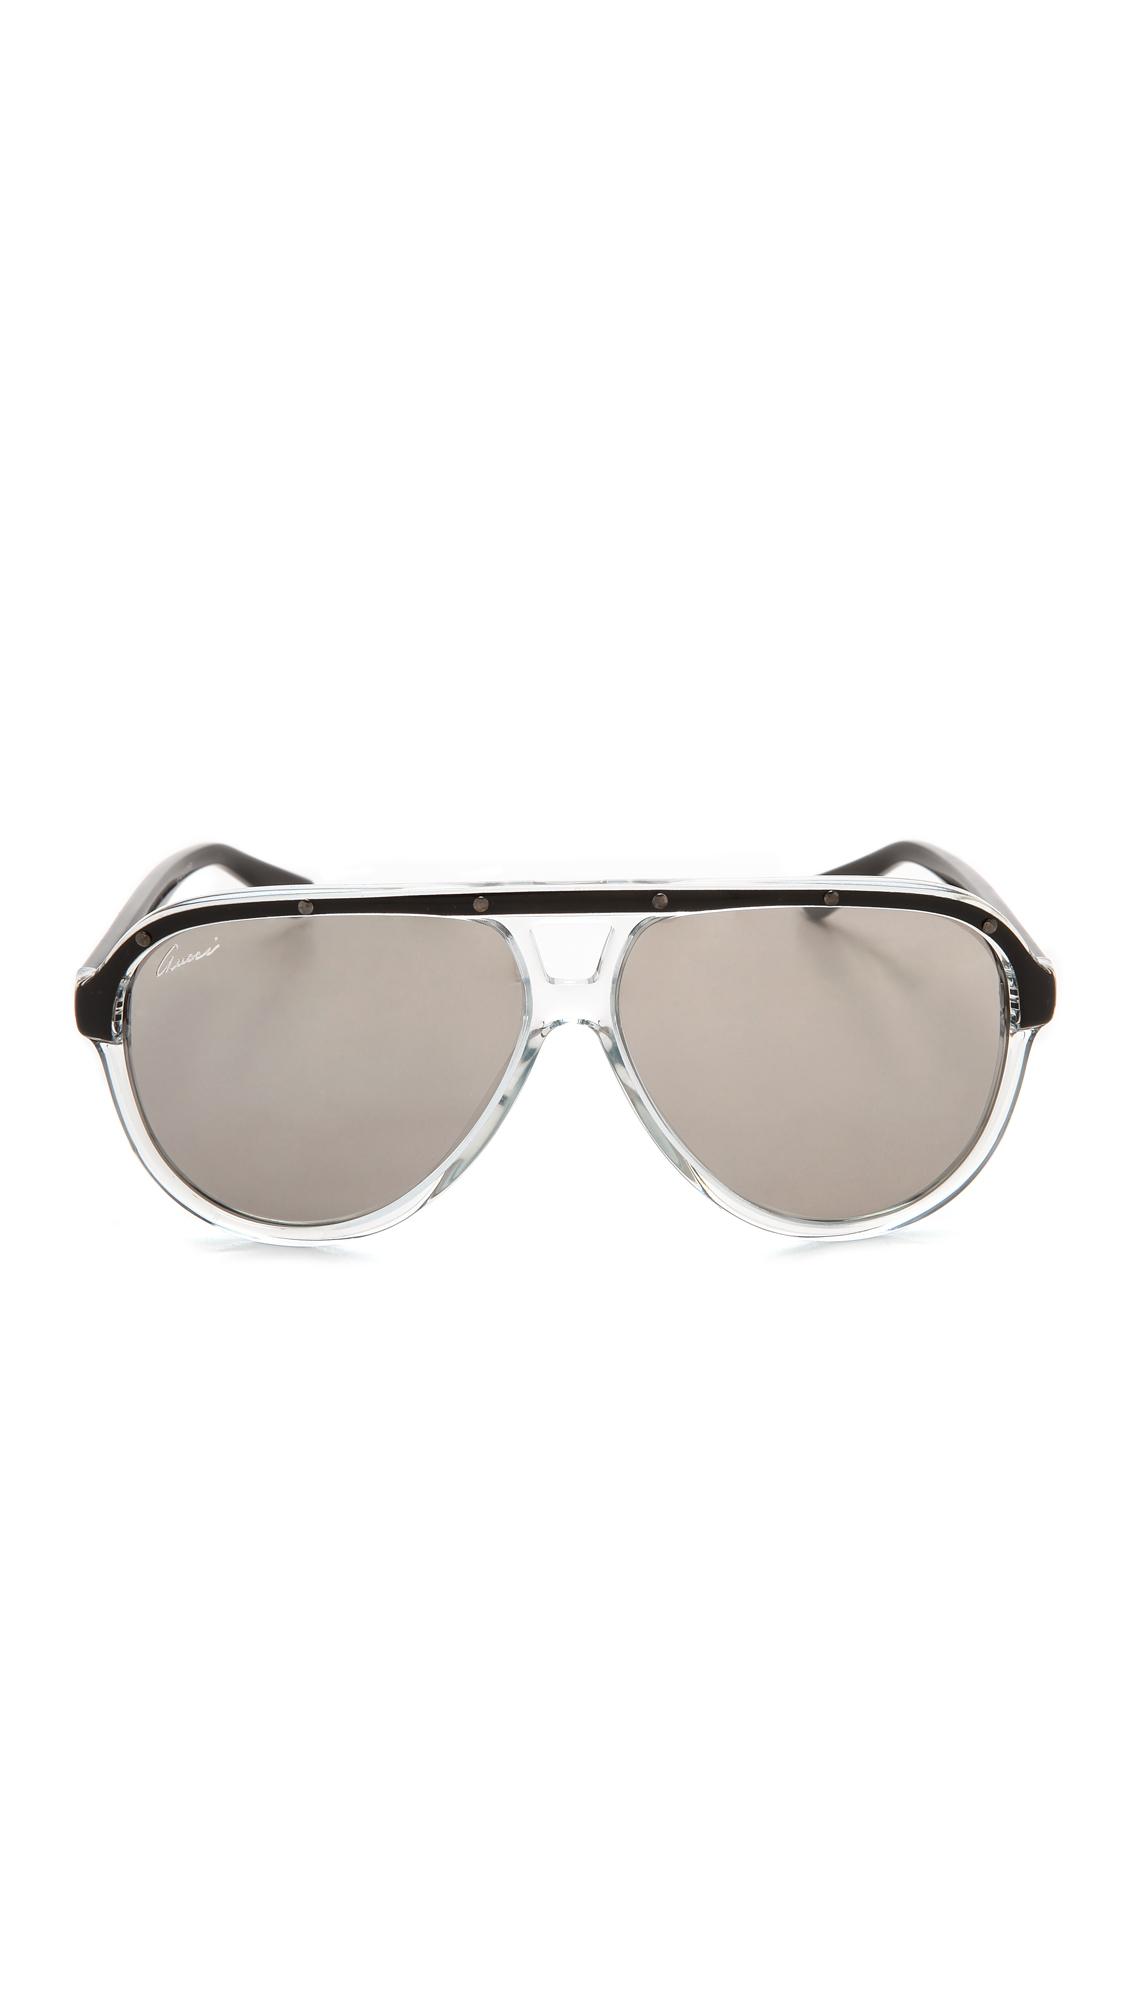 ab425386ca9 Lyst - Gucci Aviator Sunglasses - Violet Black pink in Black